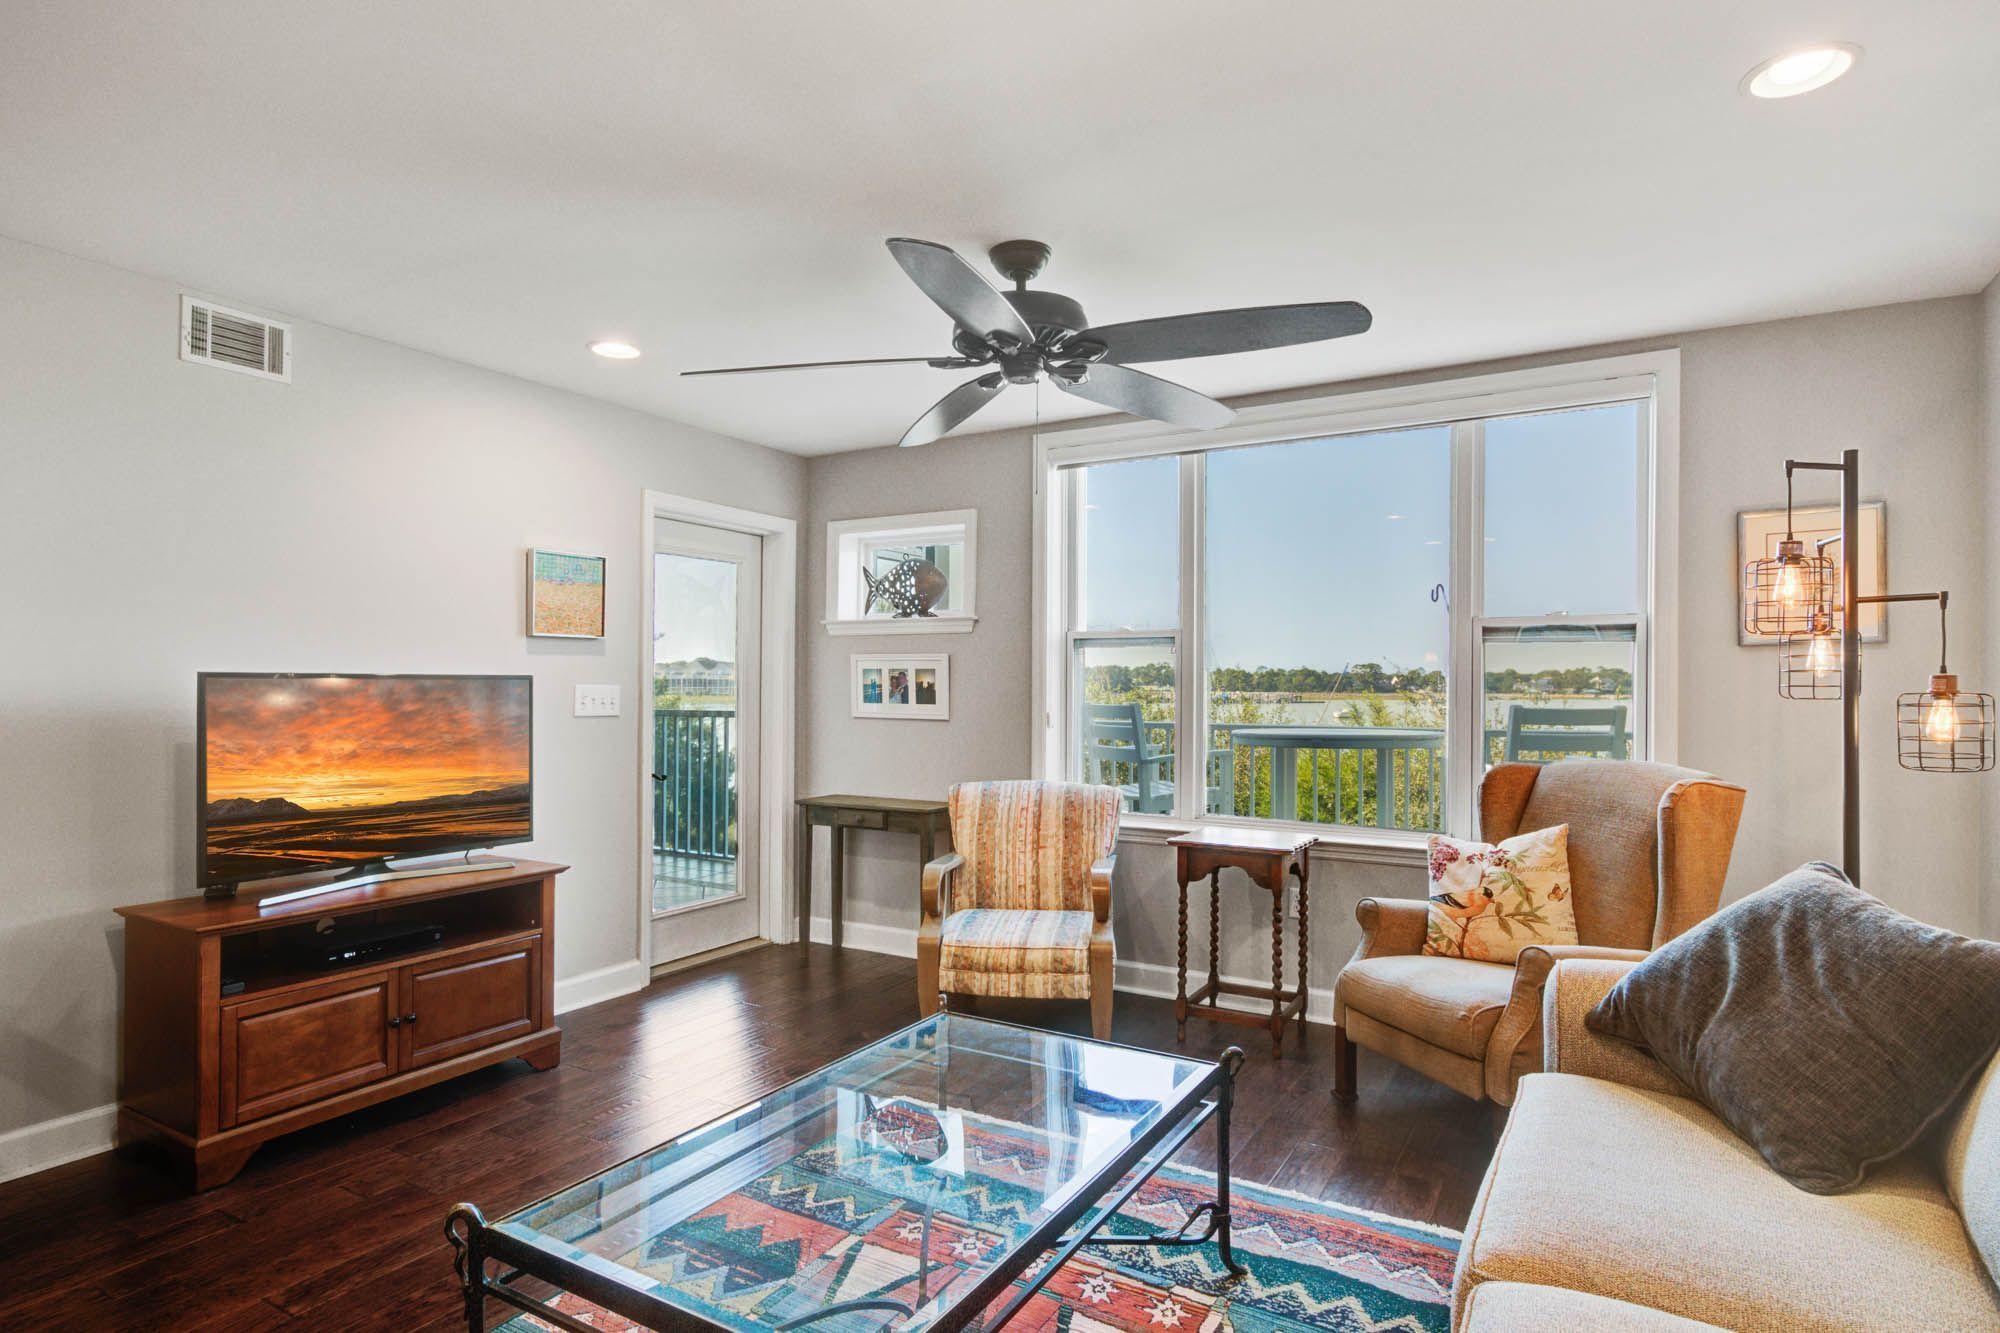 Turn of River Homes For Sale - 2395 Folly, Folly Beach, SC - 31